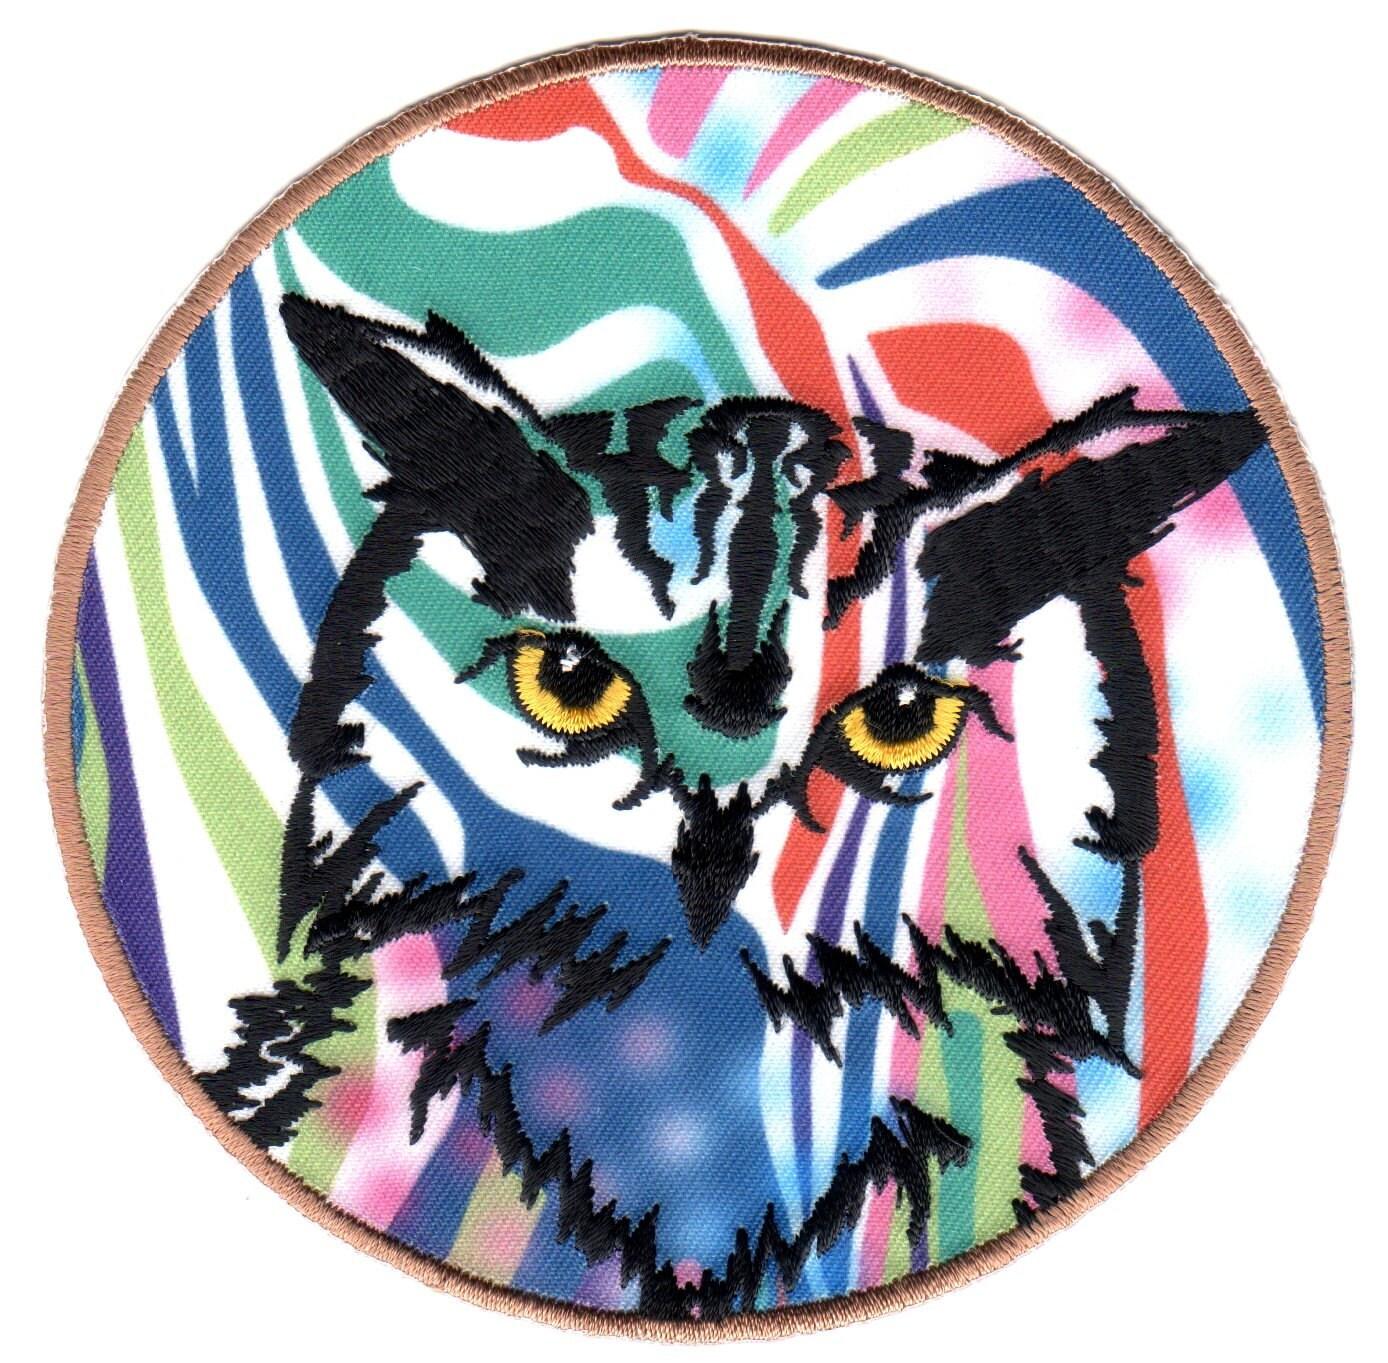 BRIGHT OWL Vinyl Sticker Laptop Tablet Tile Home Decor Embellishment Applique Patch Brand New